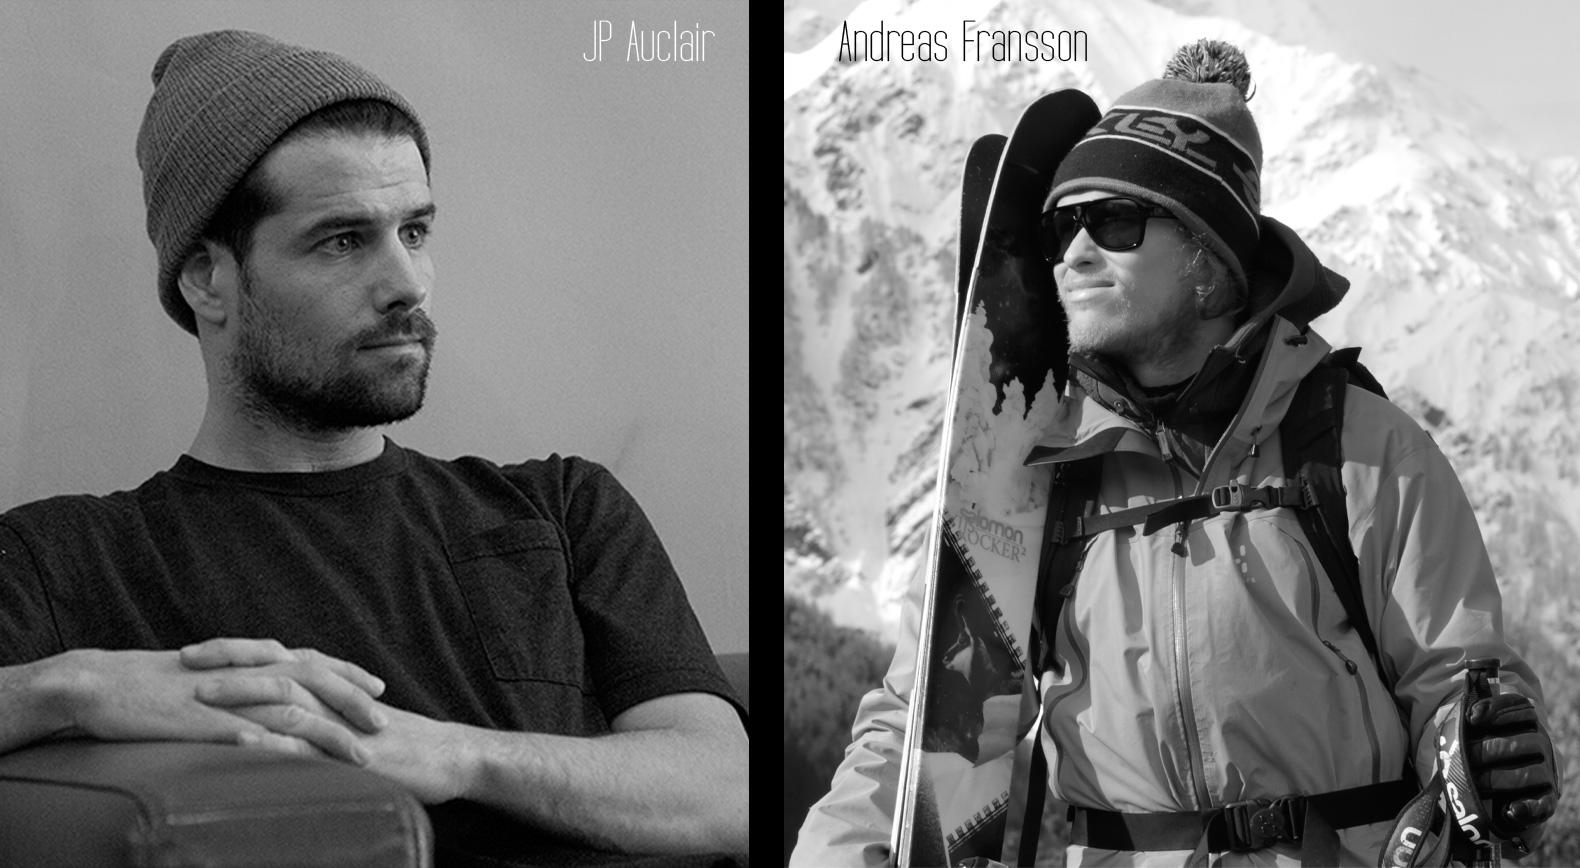 JP Auclair & Andreas Fransson. photo: freeskier.sk